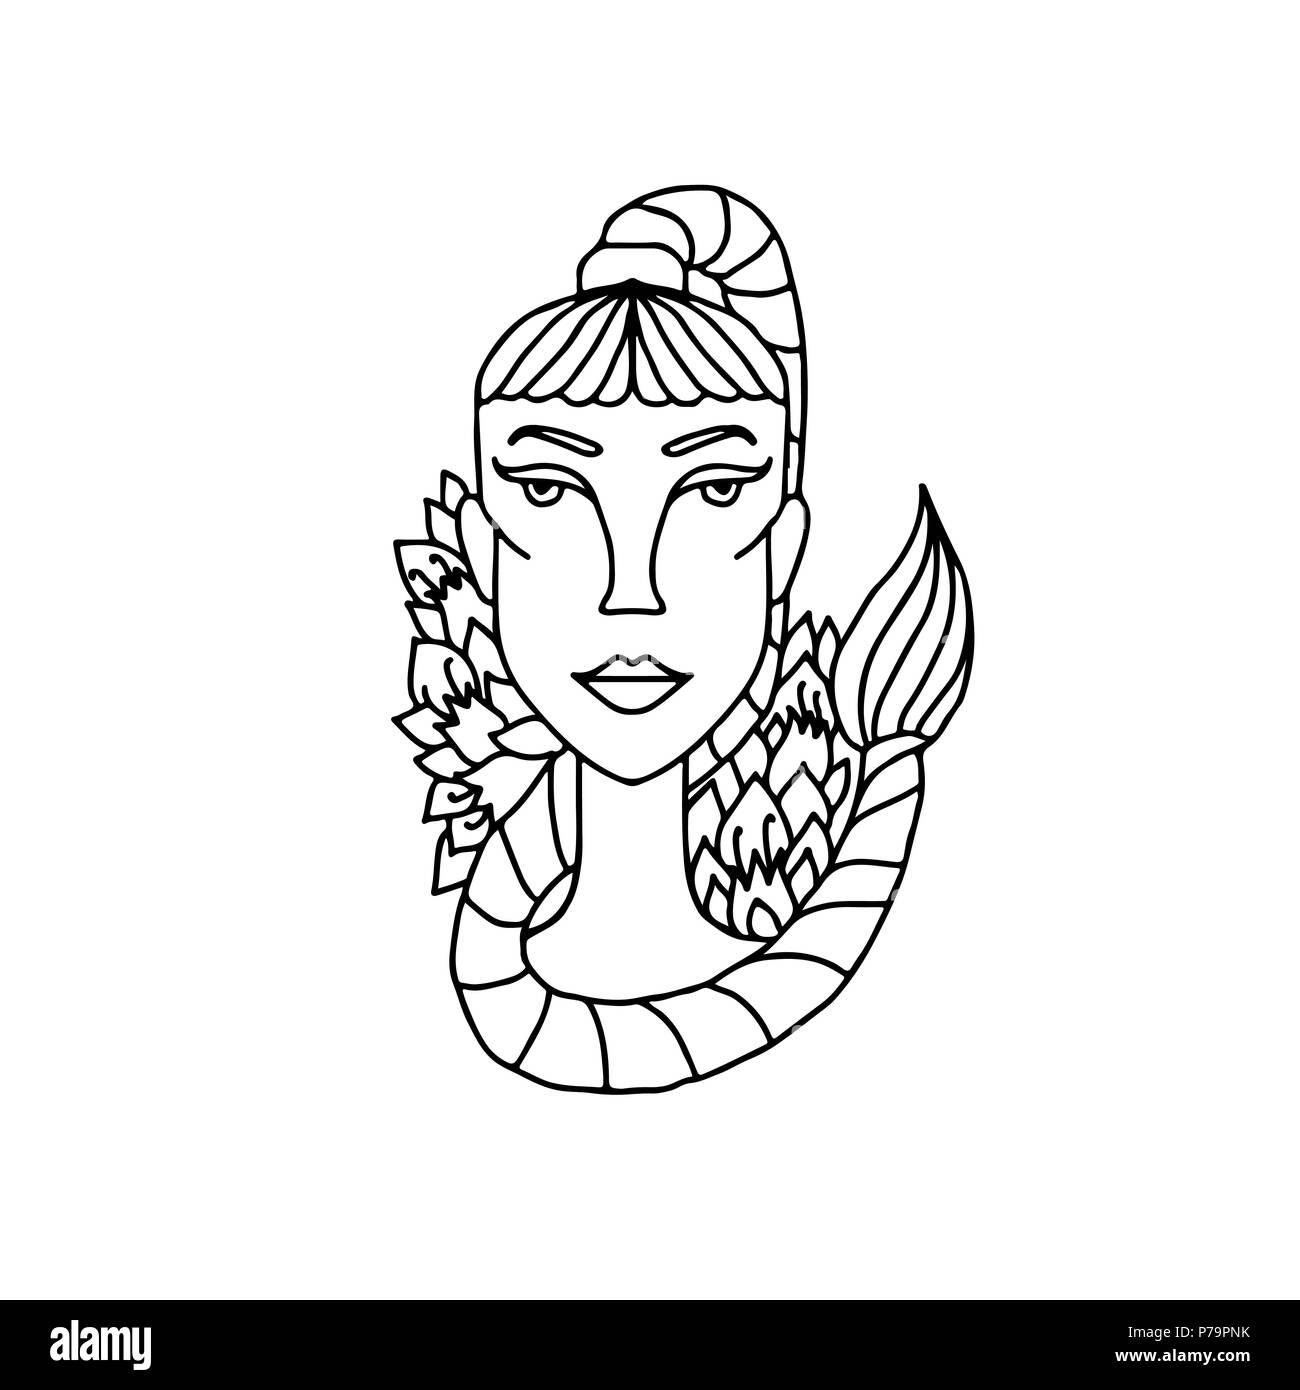 Escorpio Chica Retrato Signo Del Zodíaco Para Adulto Libro